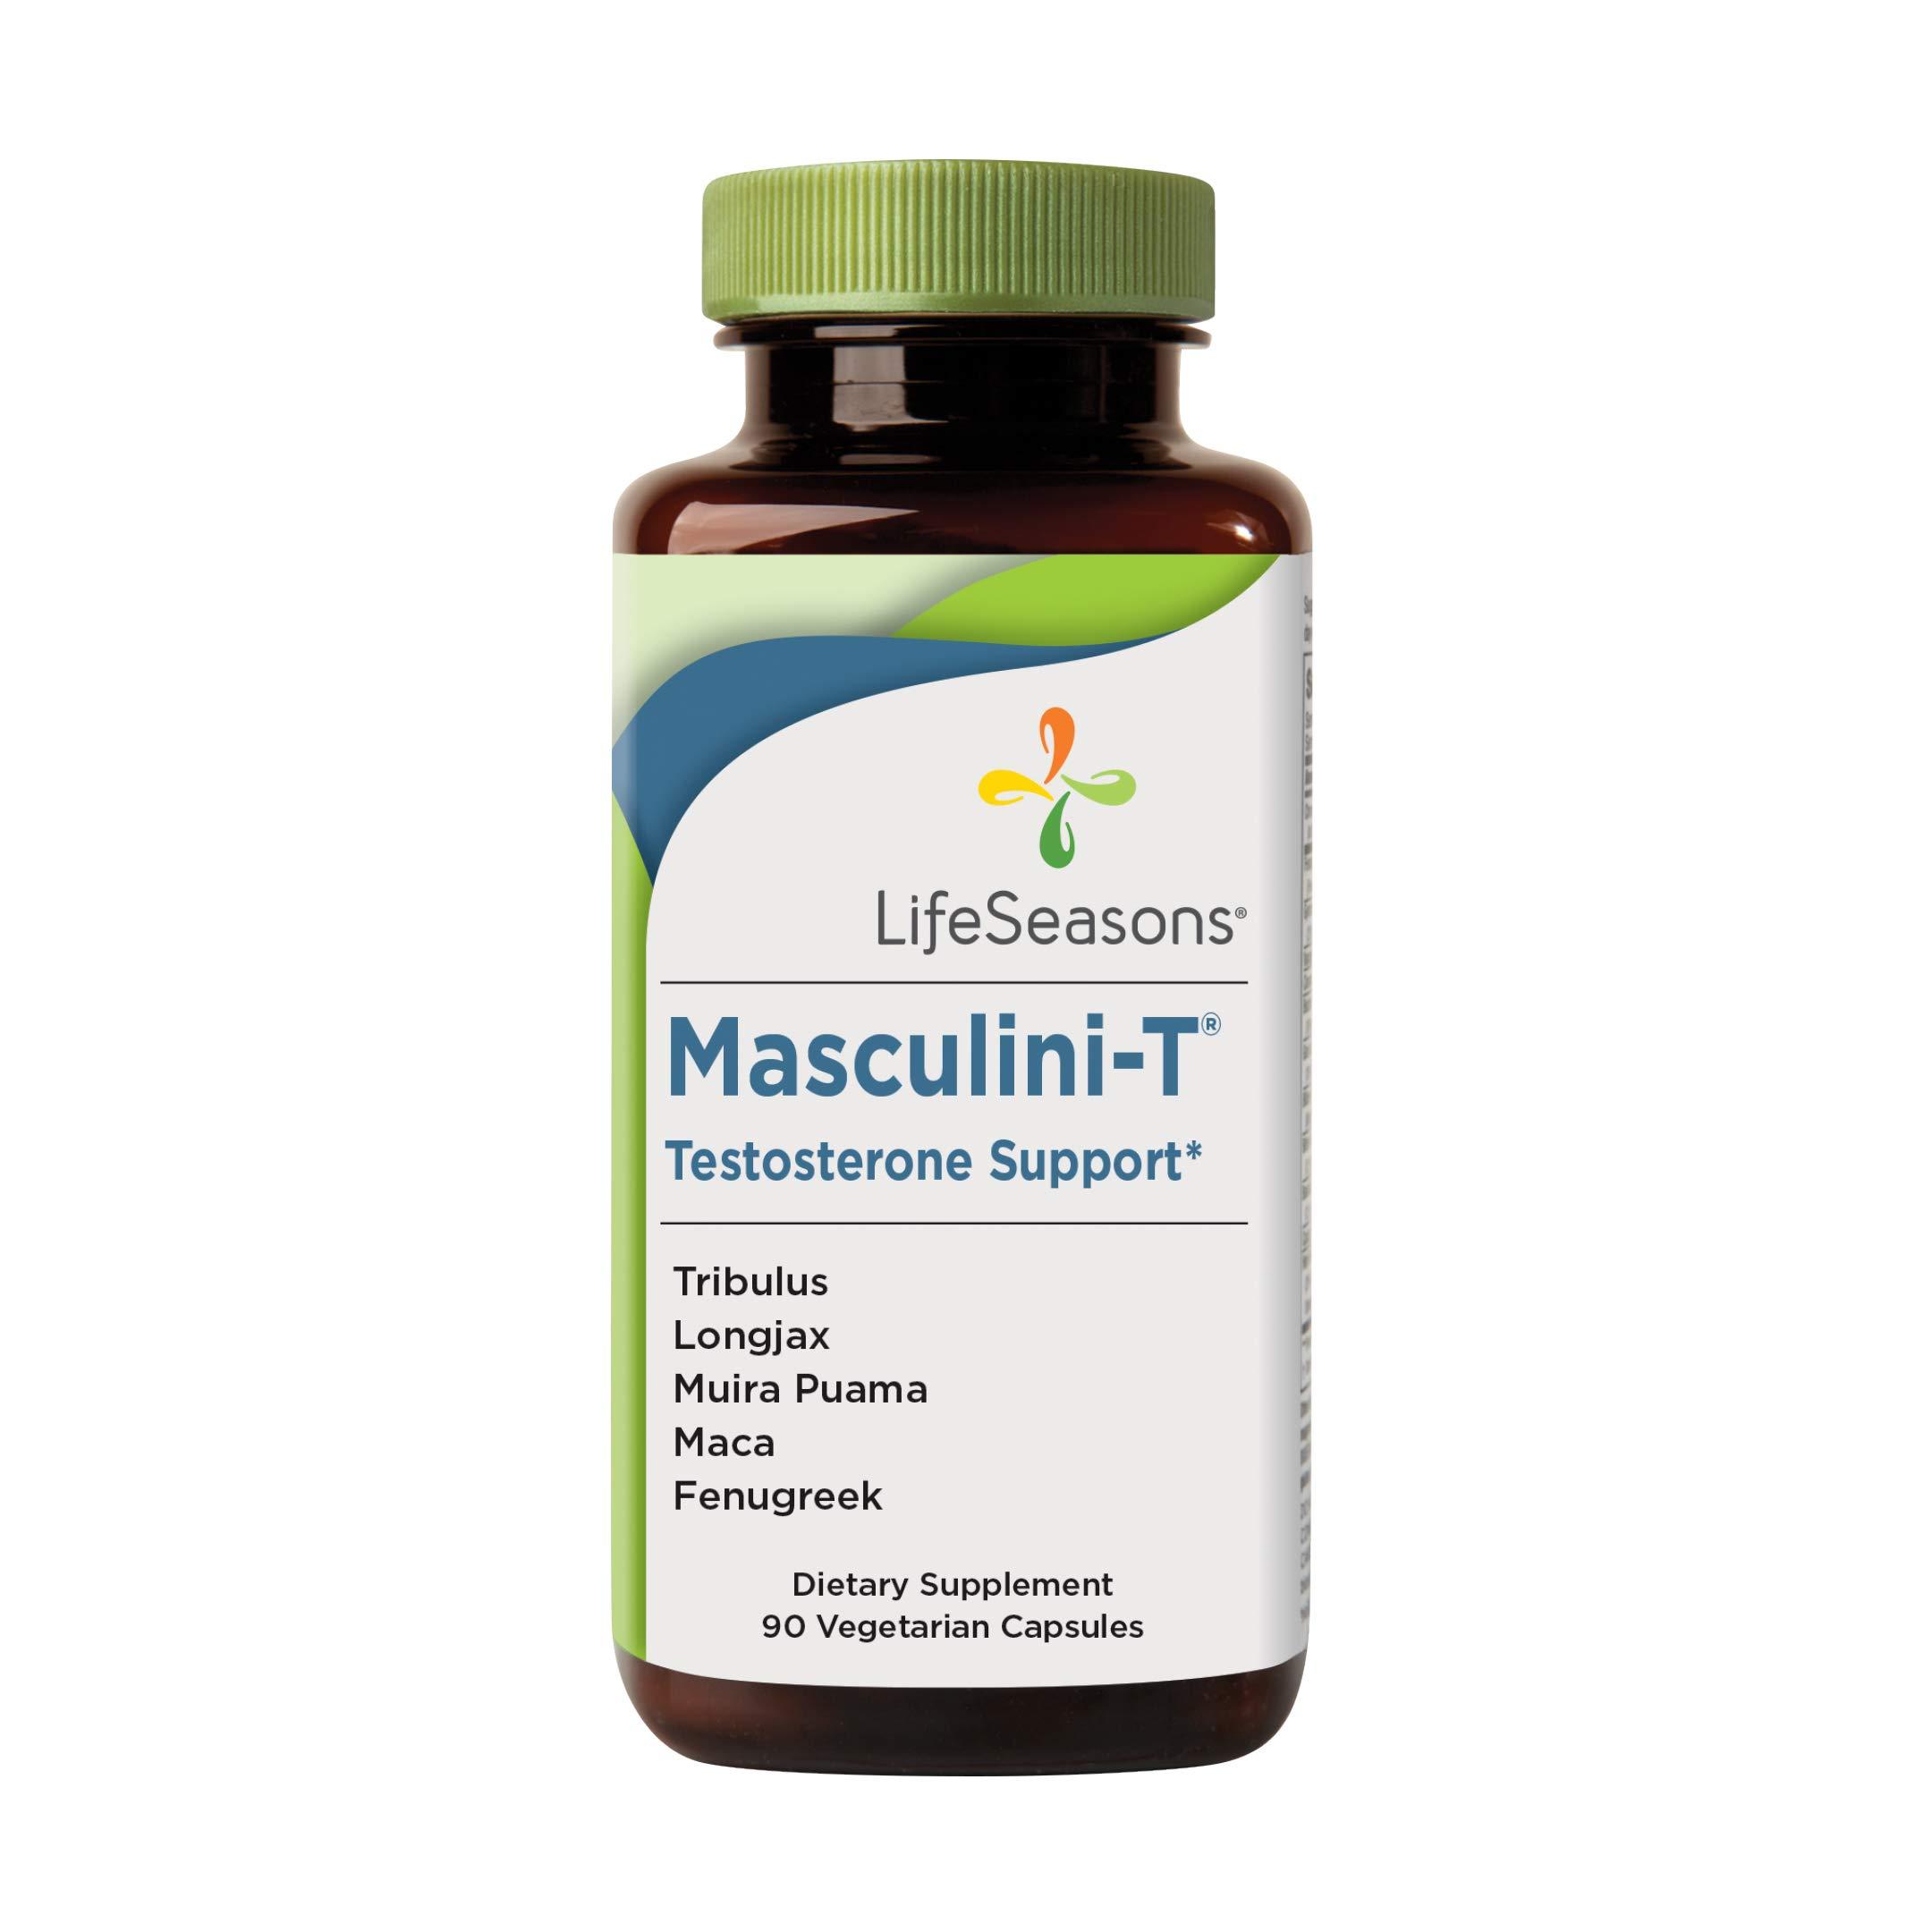 LifeSeasons - Masculini-T